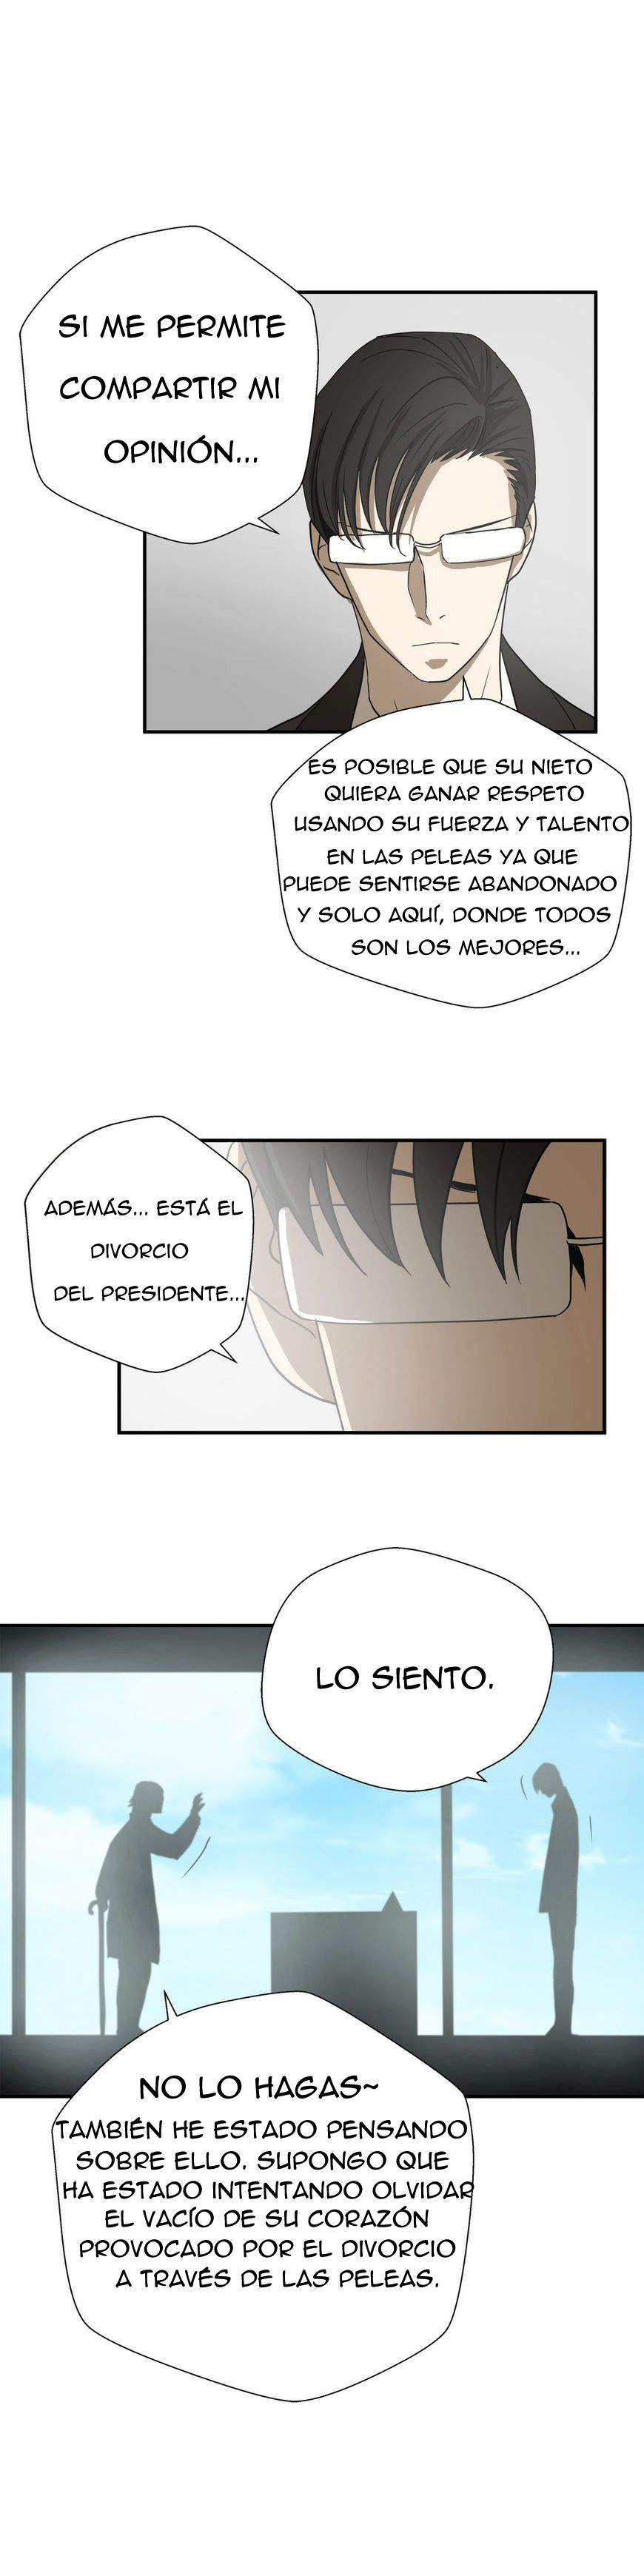 https://c5.ninemanga.com/es_manga/58/19386/461841/6775a0635c302542da2c32aa19d86be0.jpg Page 8